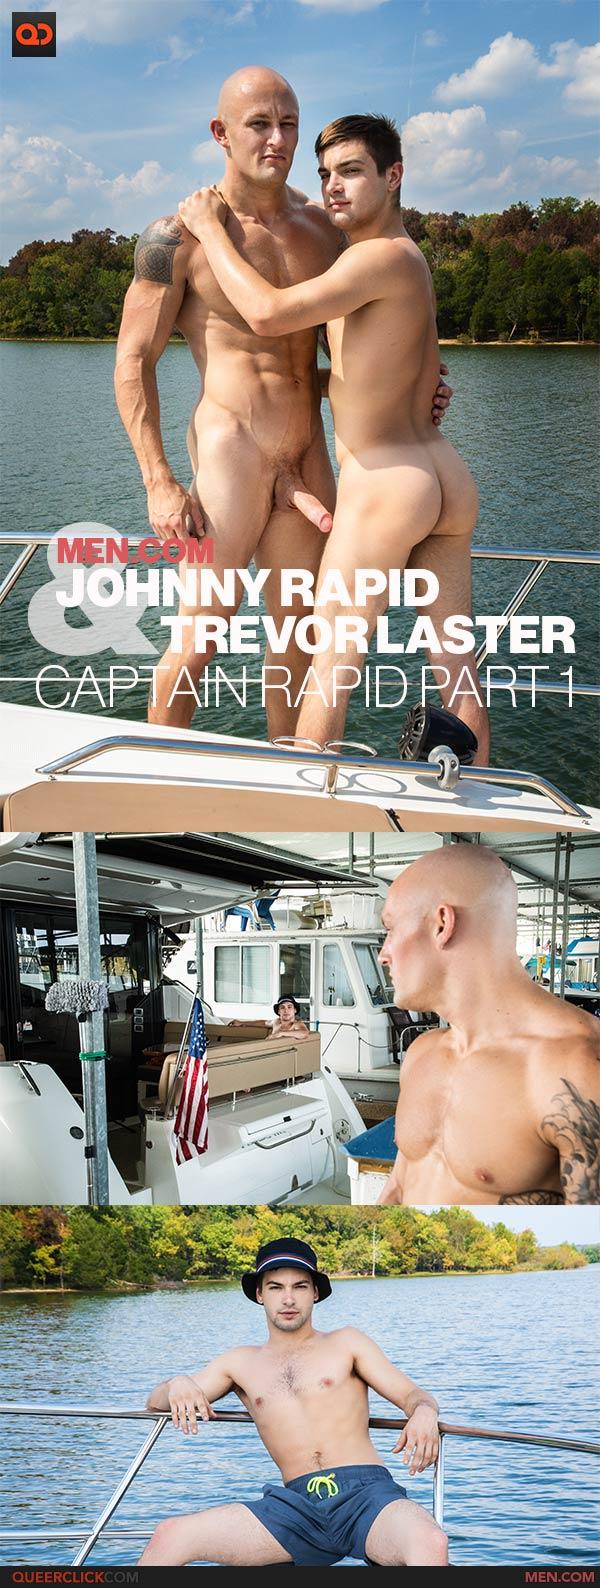 Men.com: Johnny Rapid and Trevor Laster